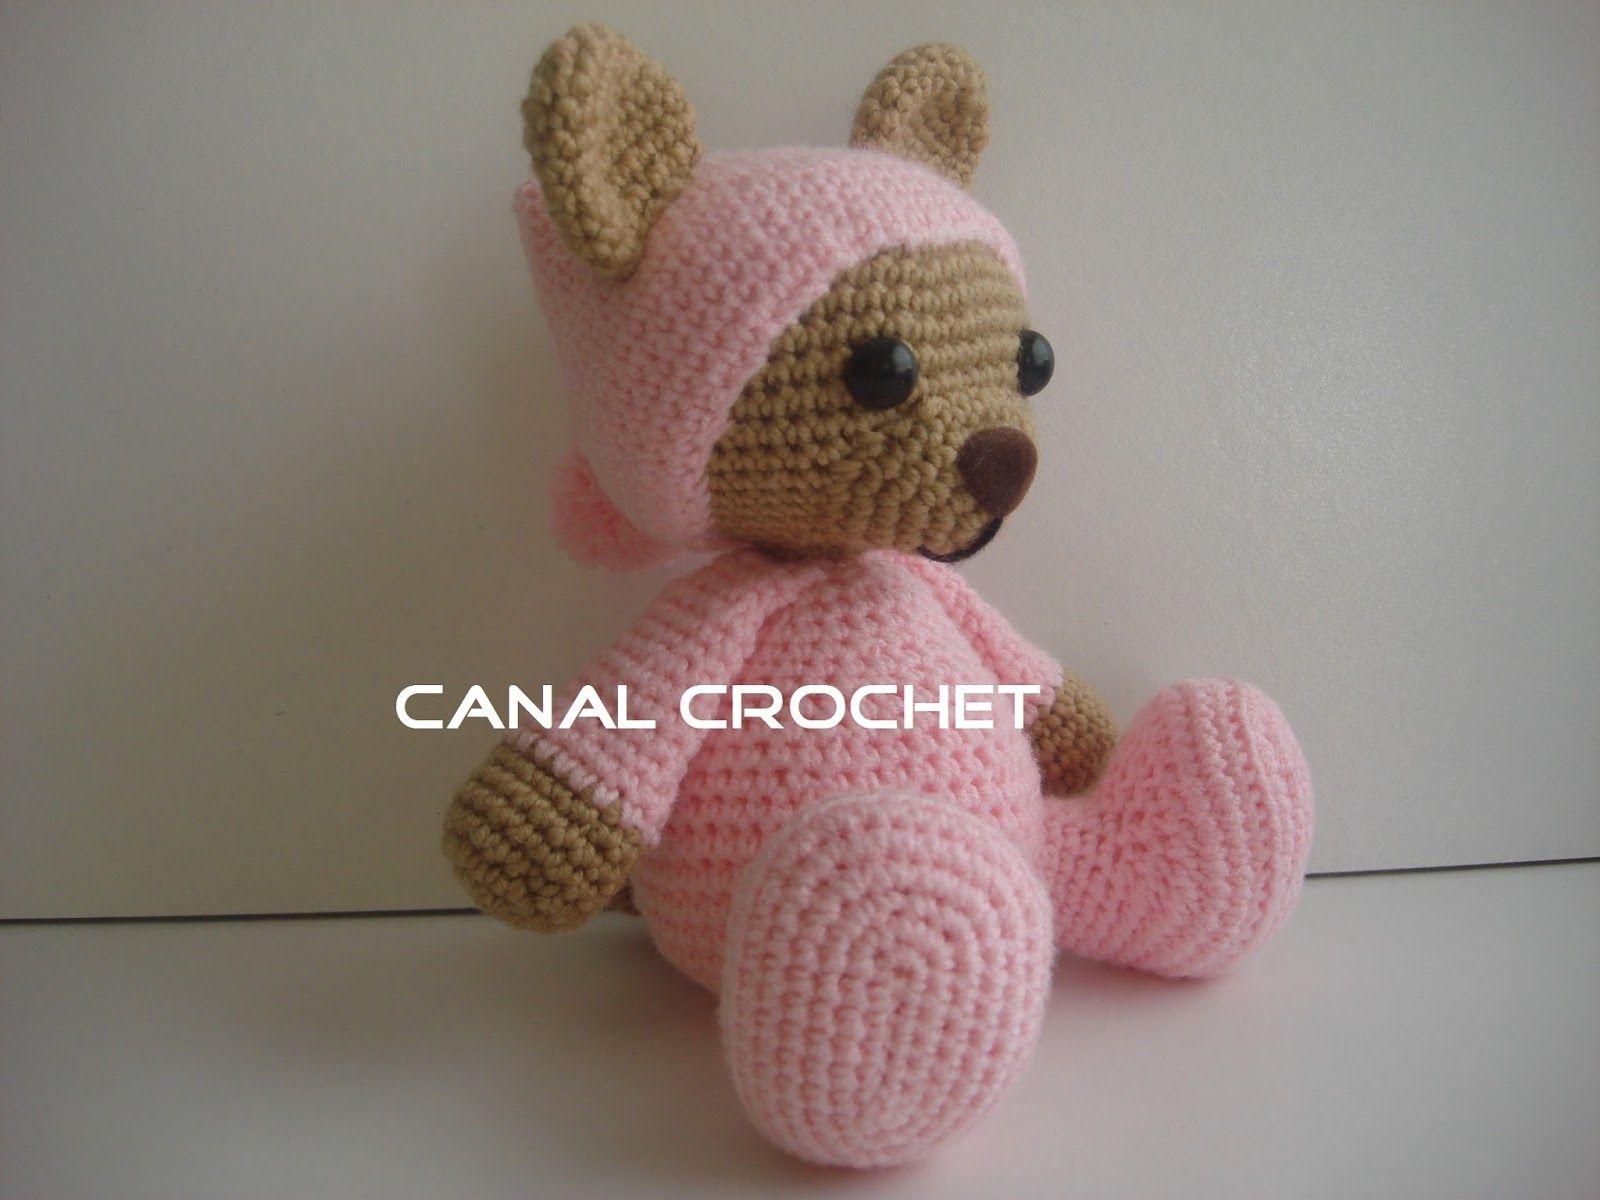 Amigurumi Oso Pijama : Canal crochet oso pijama amigurumi amigurumi